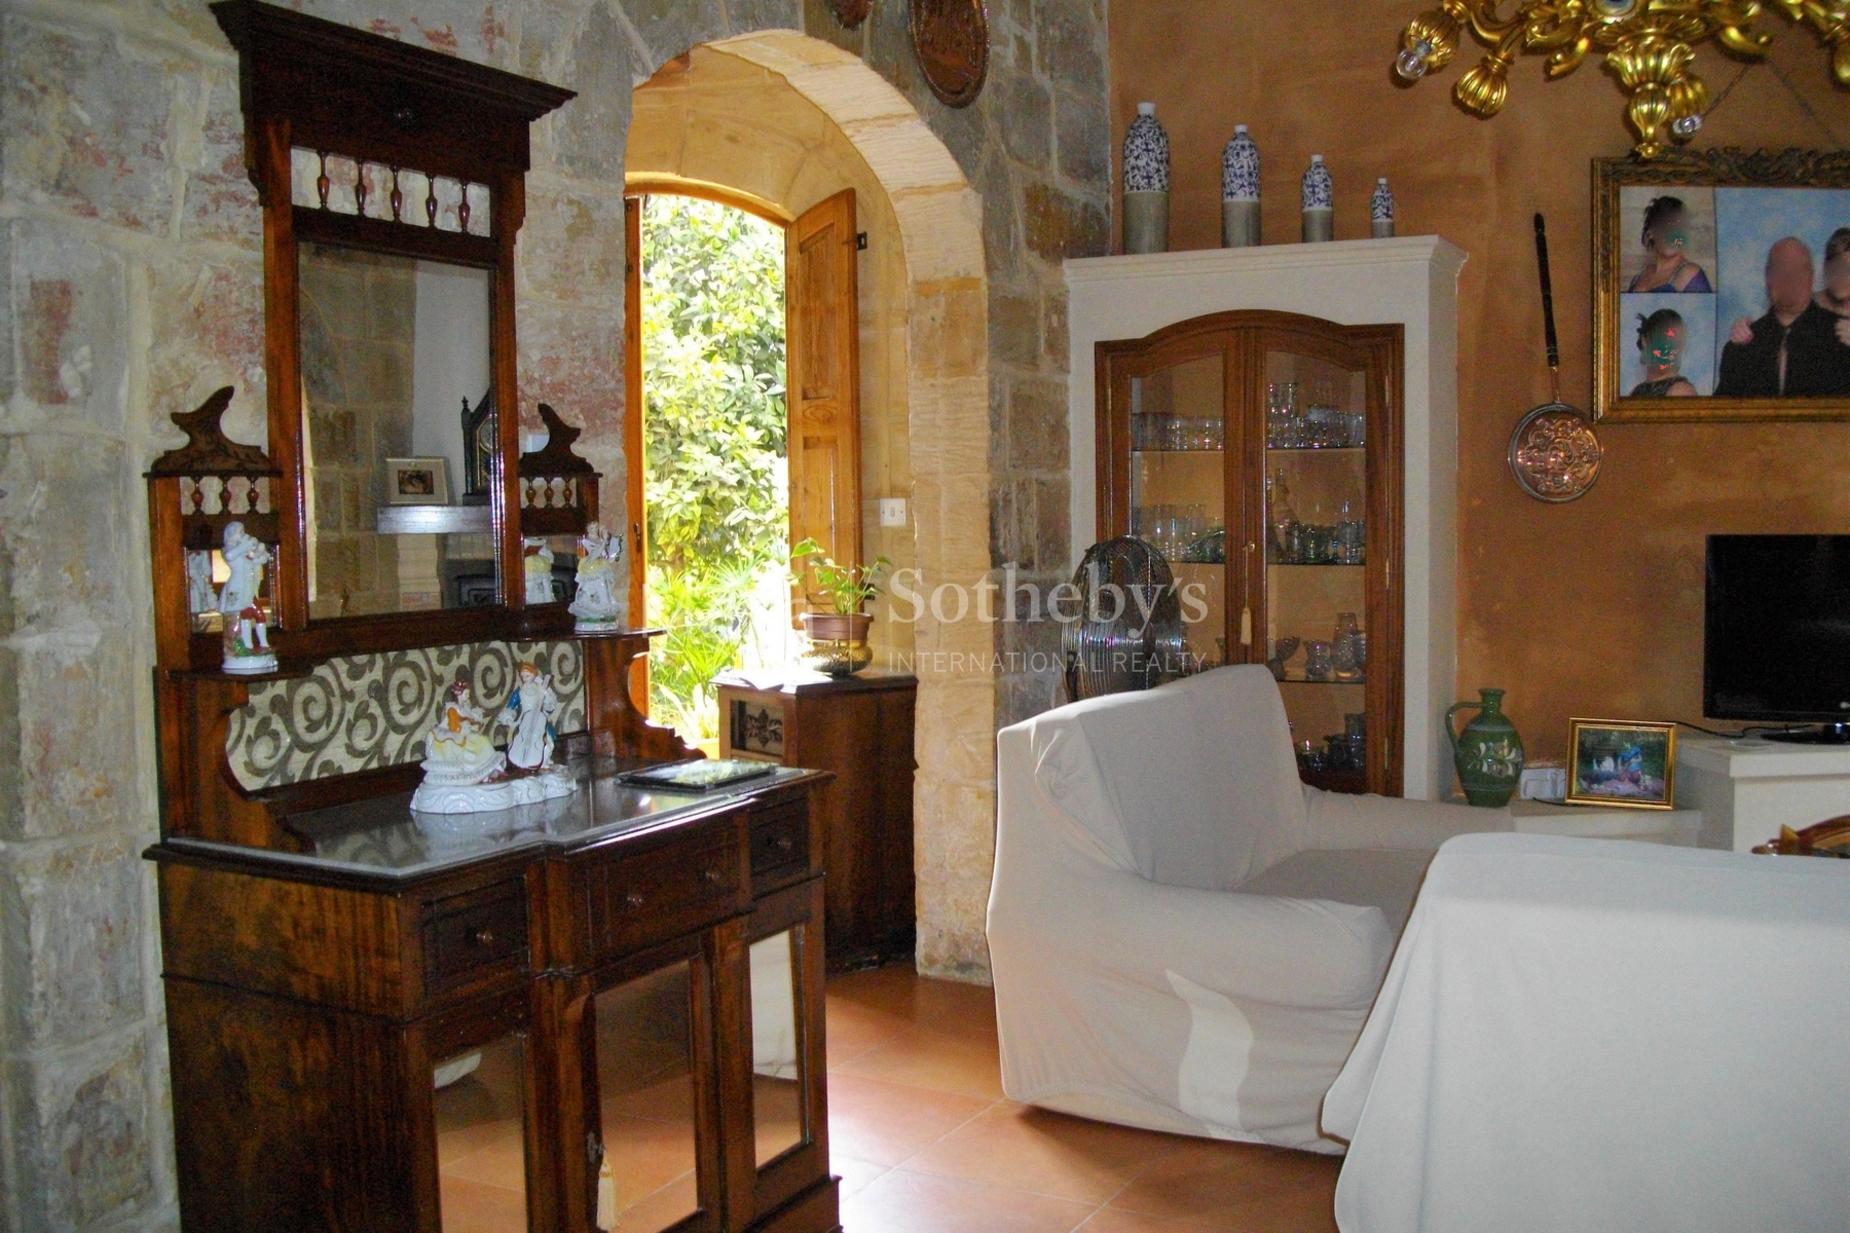 4 bed Villa For Rent in Siggiewi, Siggiewi - thumb 9